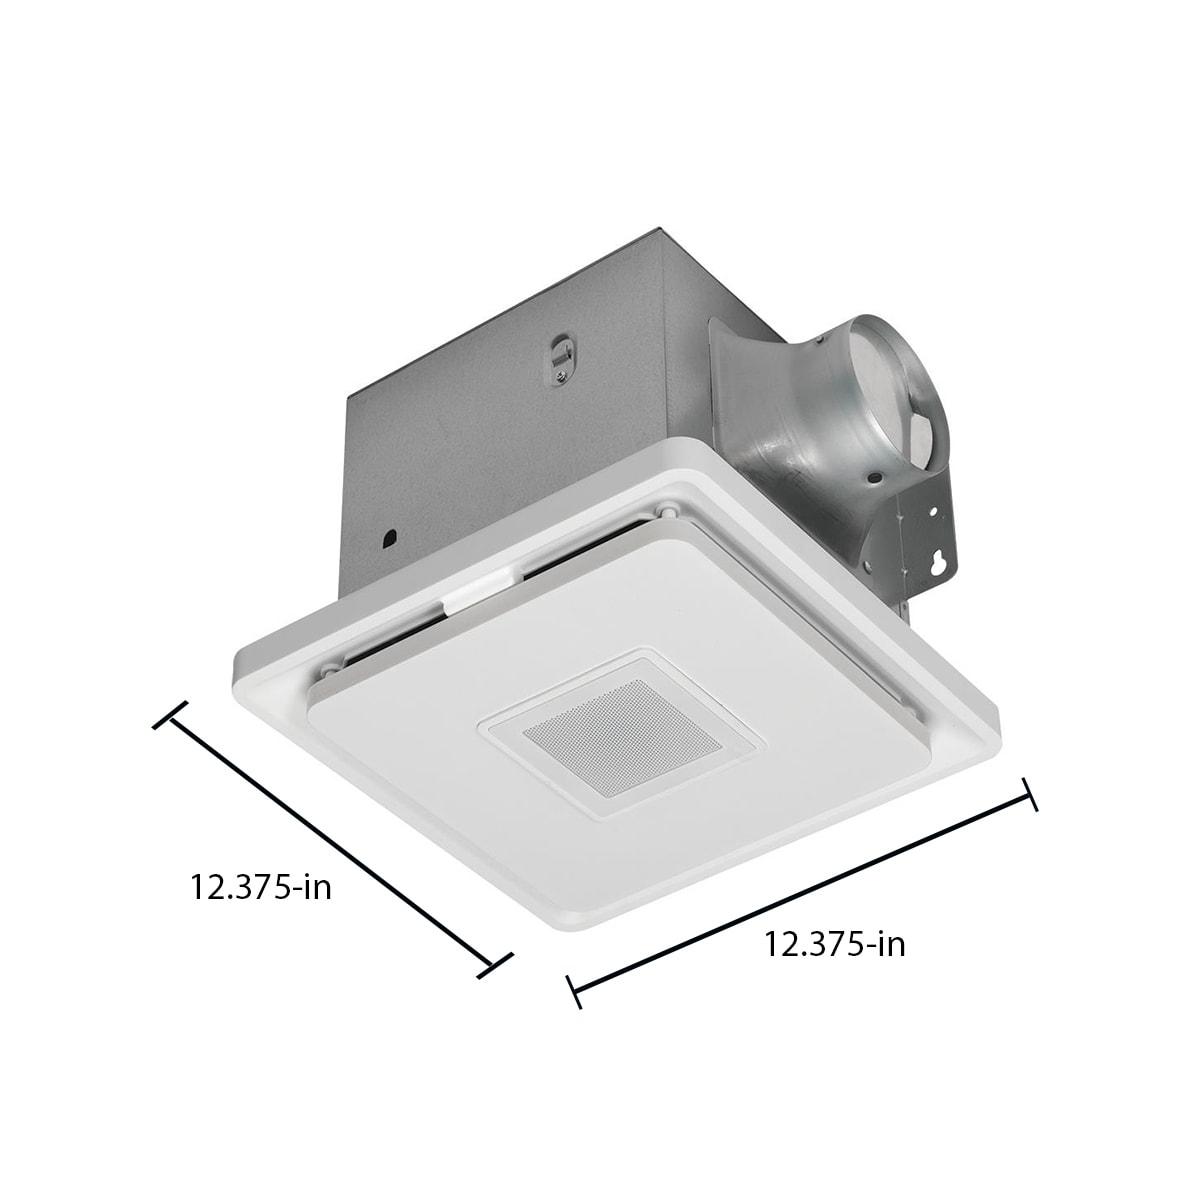 Homewerks 20.20 Sone 20200 CFM White Decorative Lighted Bathroom Fan ...